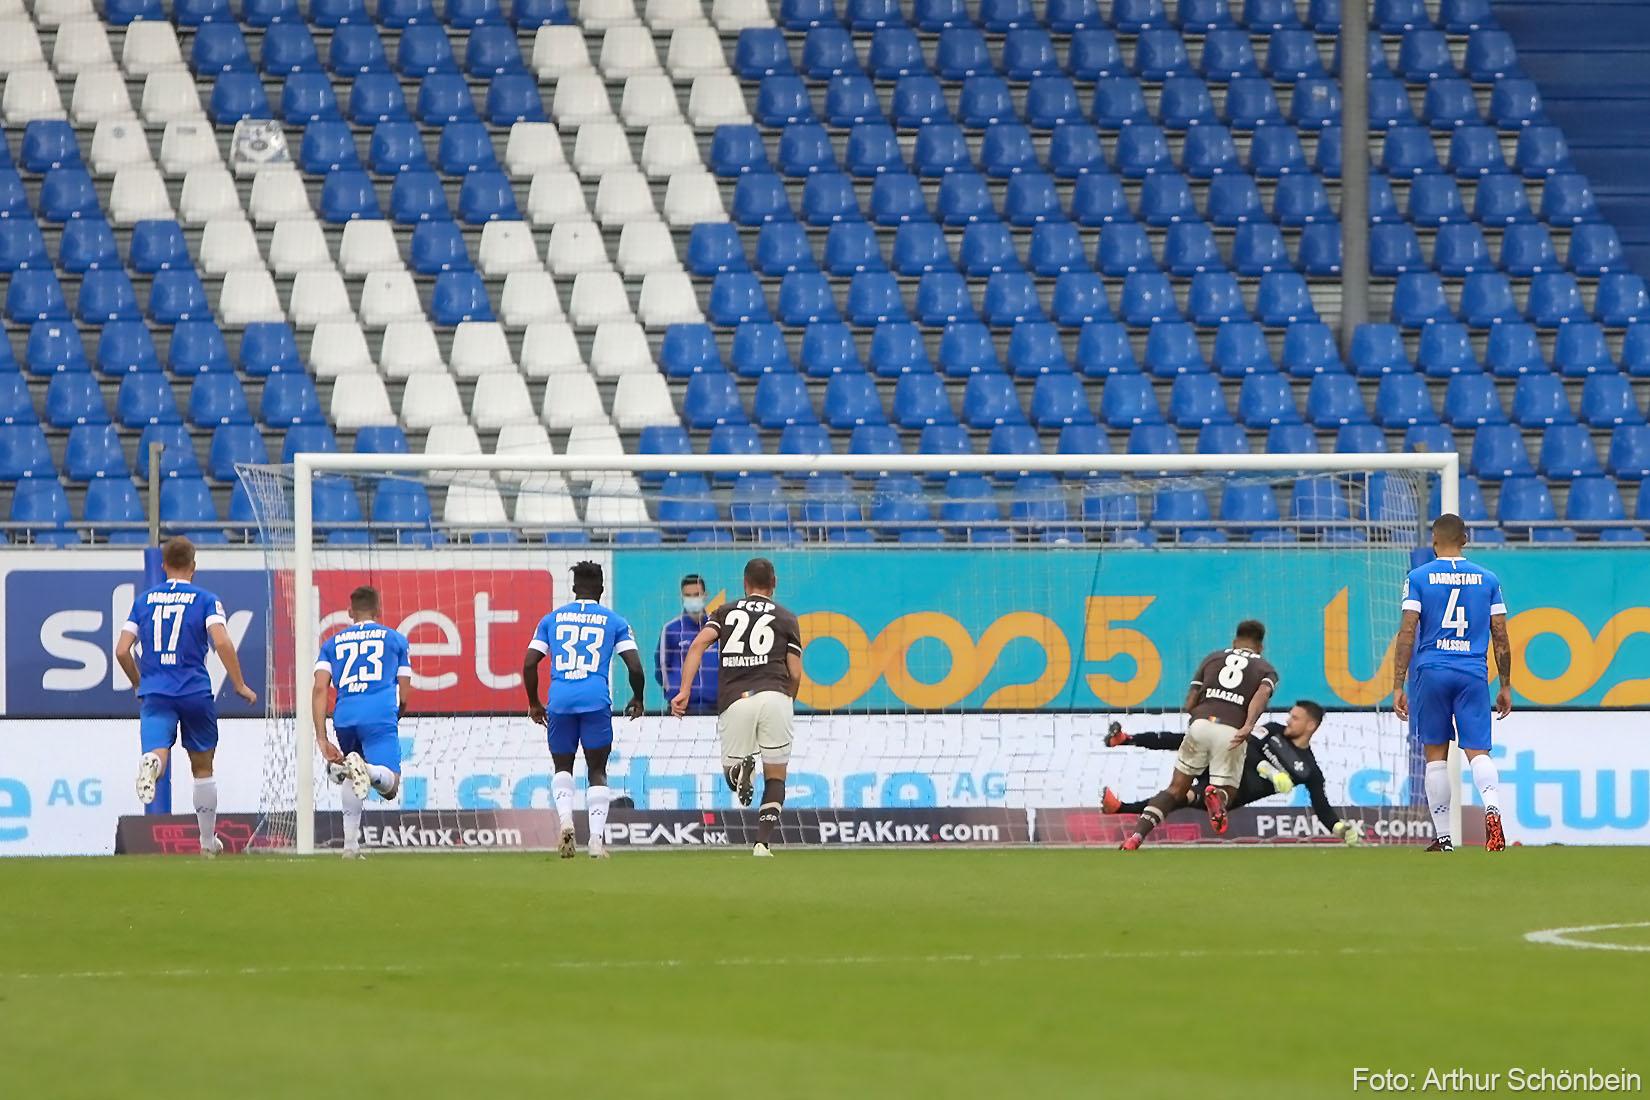 Elfmeterseuche beim SV Darmstadt 98 – Anfang konsterniert